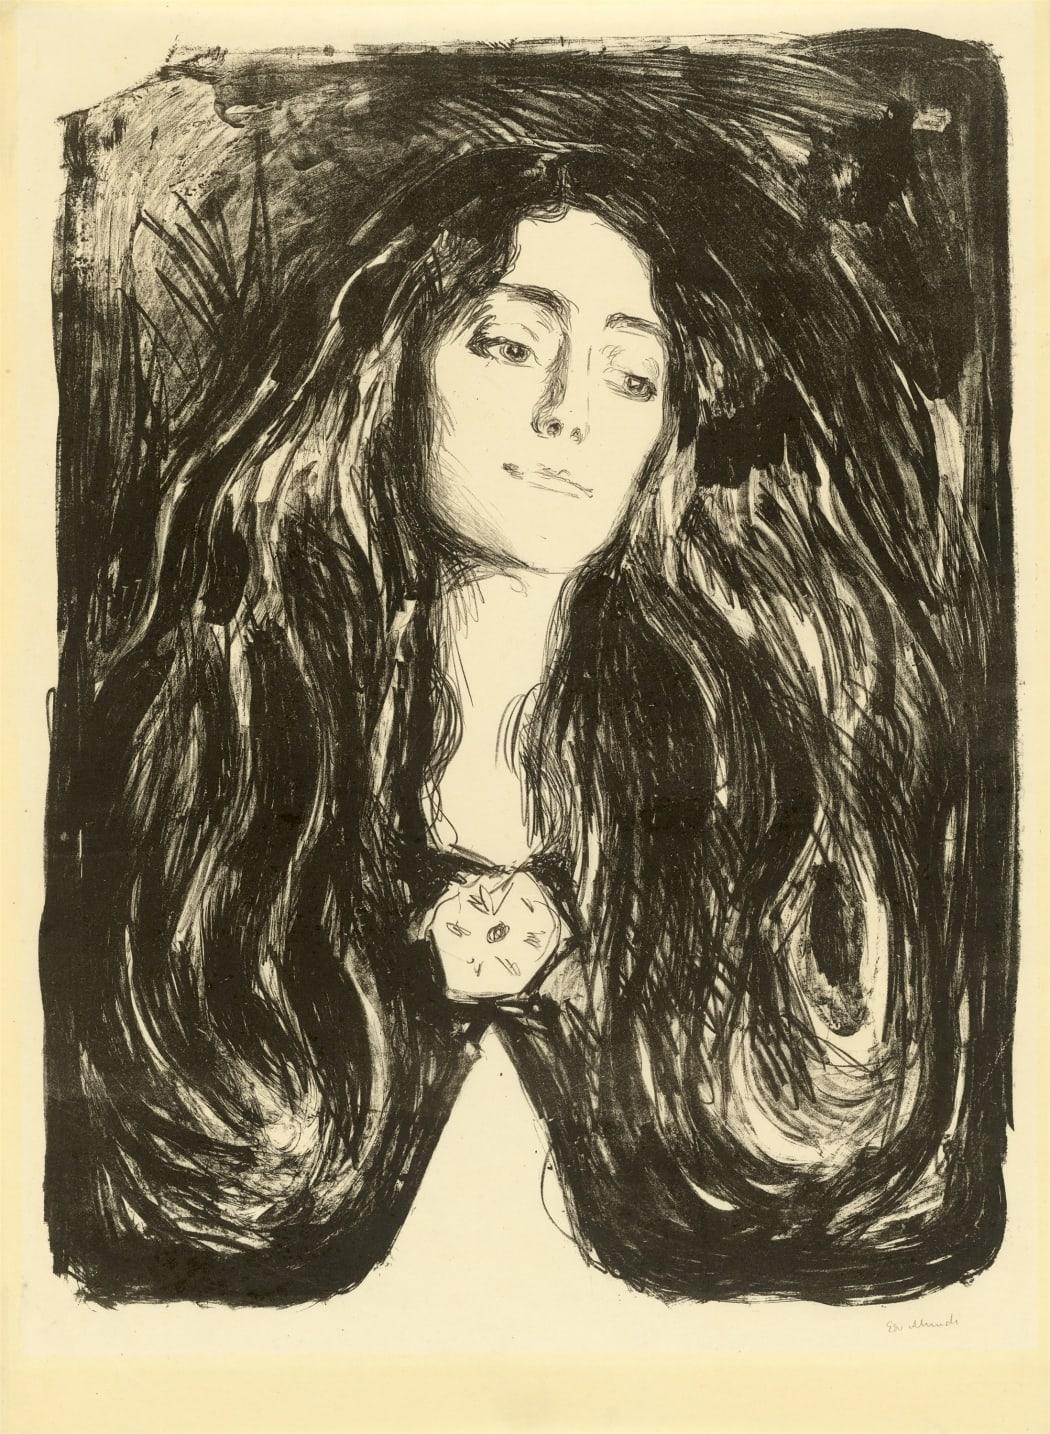 Die Brosche. Eva Mudocci (Woll 244) , 1903, lithograph, 23 7/8 x 18 3/8 inches